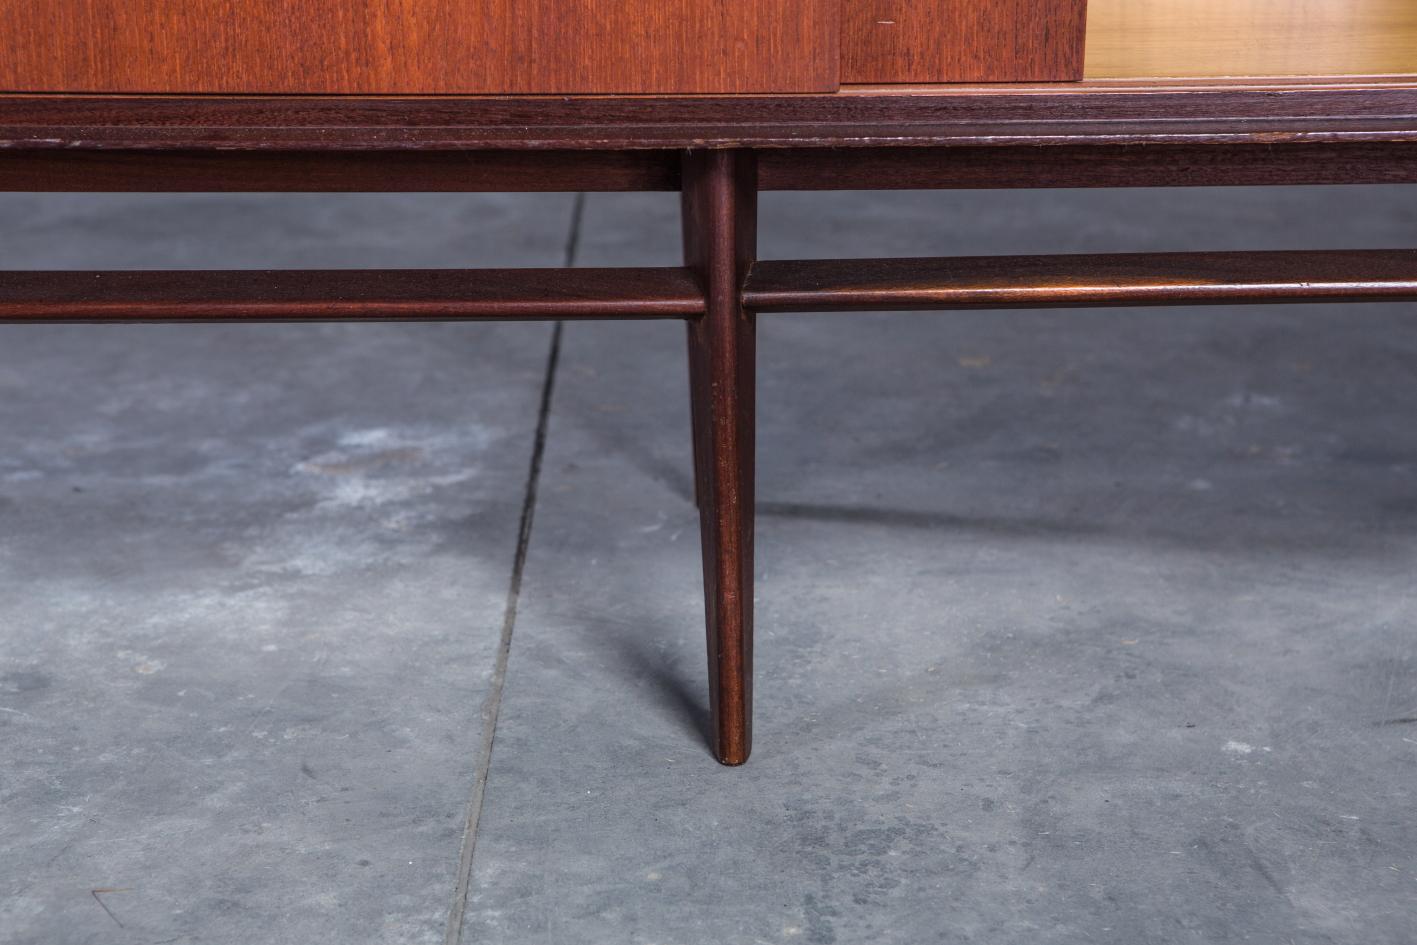 Teak sideboard - Palutari for Dassi - Legs detail